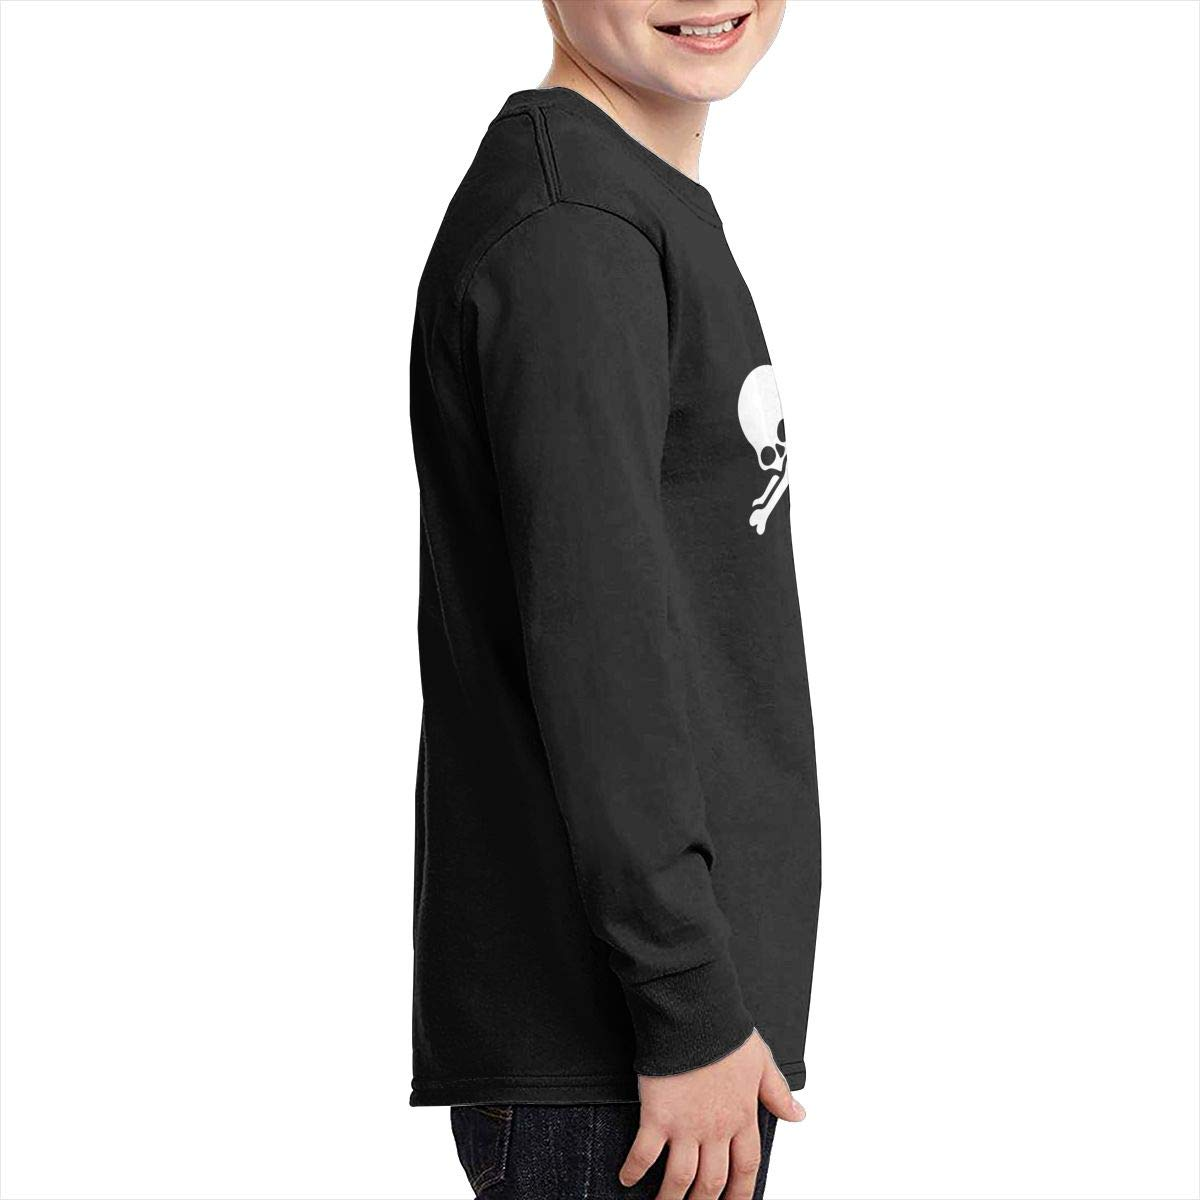 Teenagers Teen Girl Skeleton Dabbing Bowling Ball Printed Long Sleeve 100/% Cotton T-Shirts